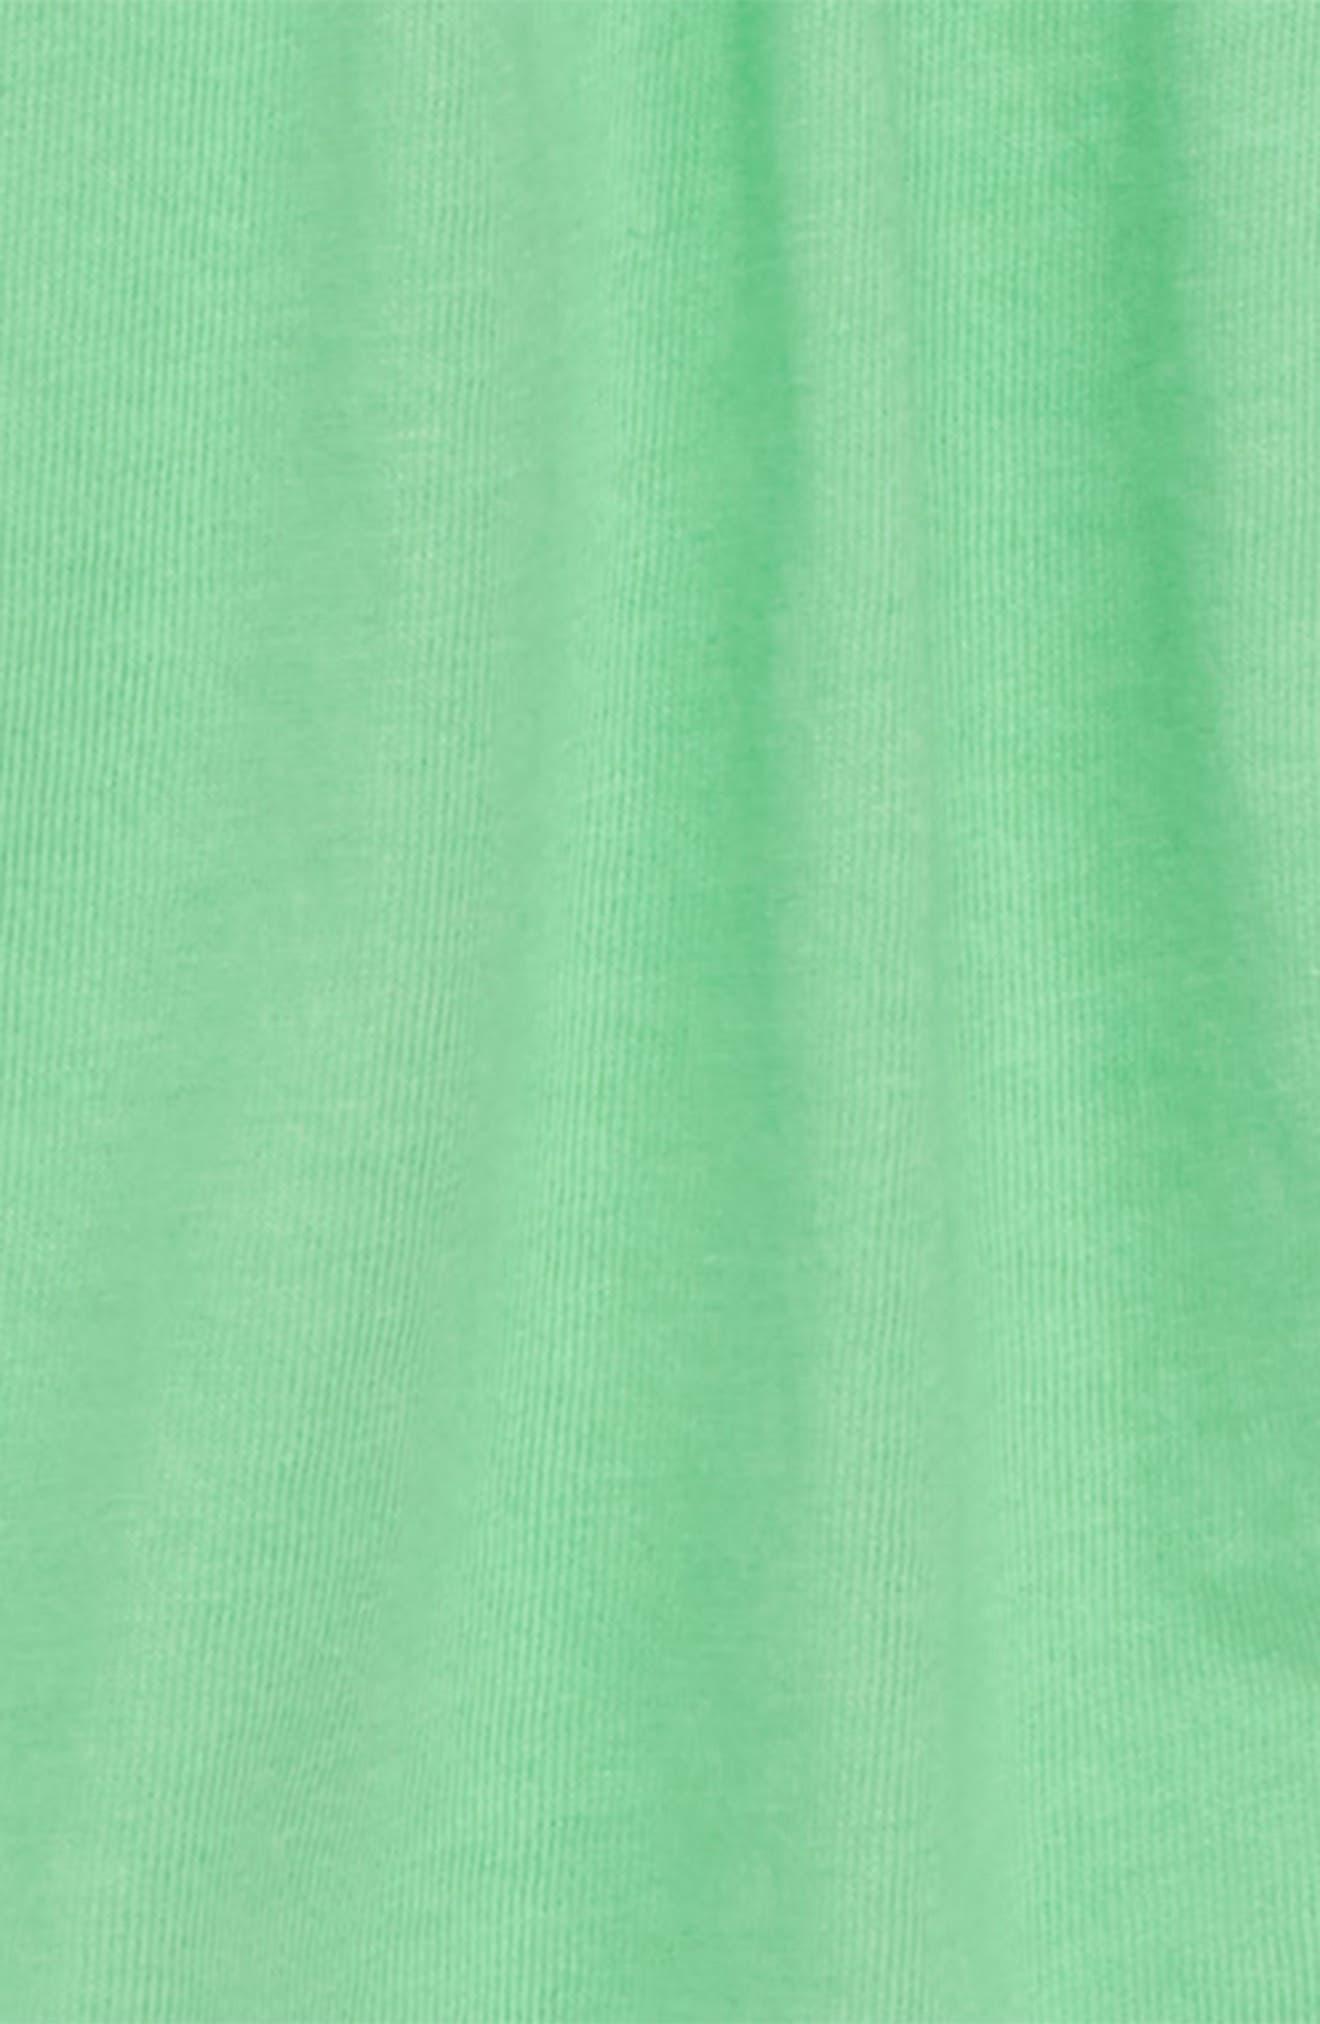 Bell Sleeve Tee,                             Alternate thumbnail 2, color,                             300